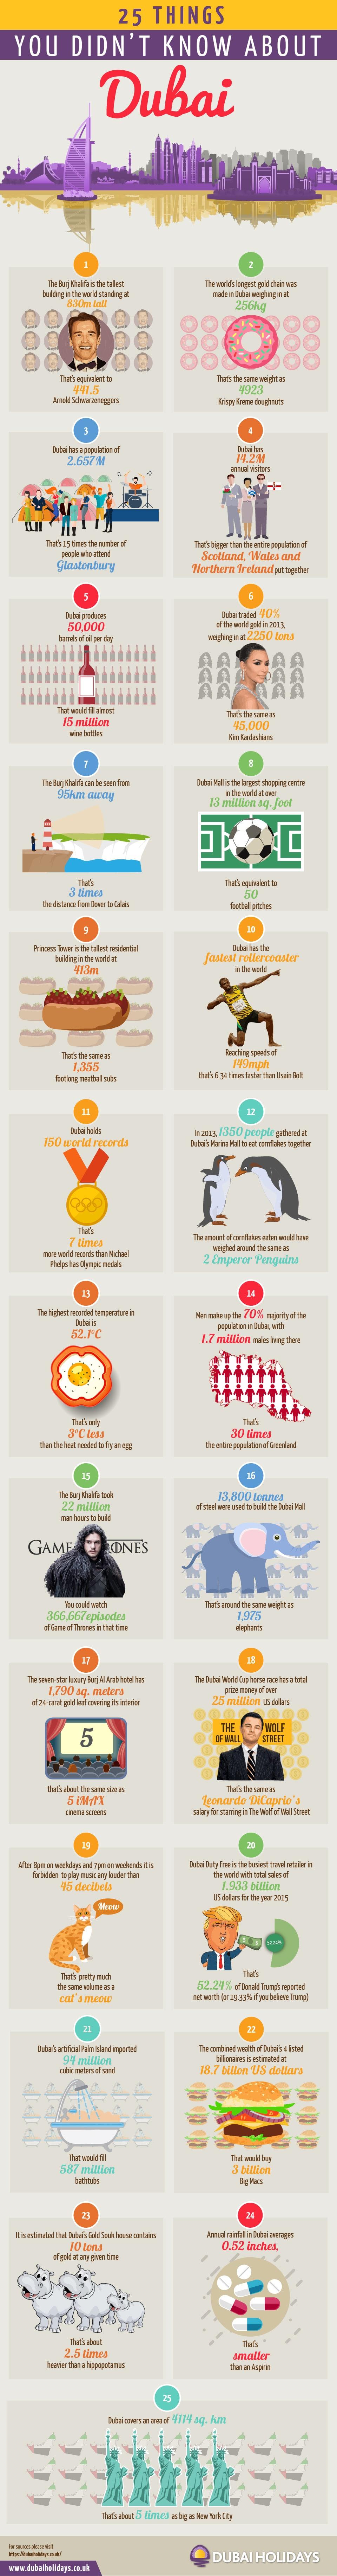 25 Amazing Facts Dubai Infographic